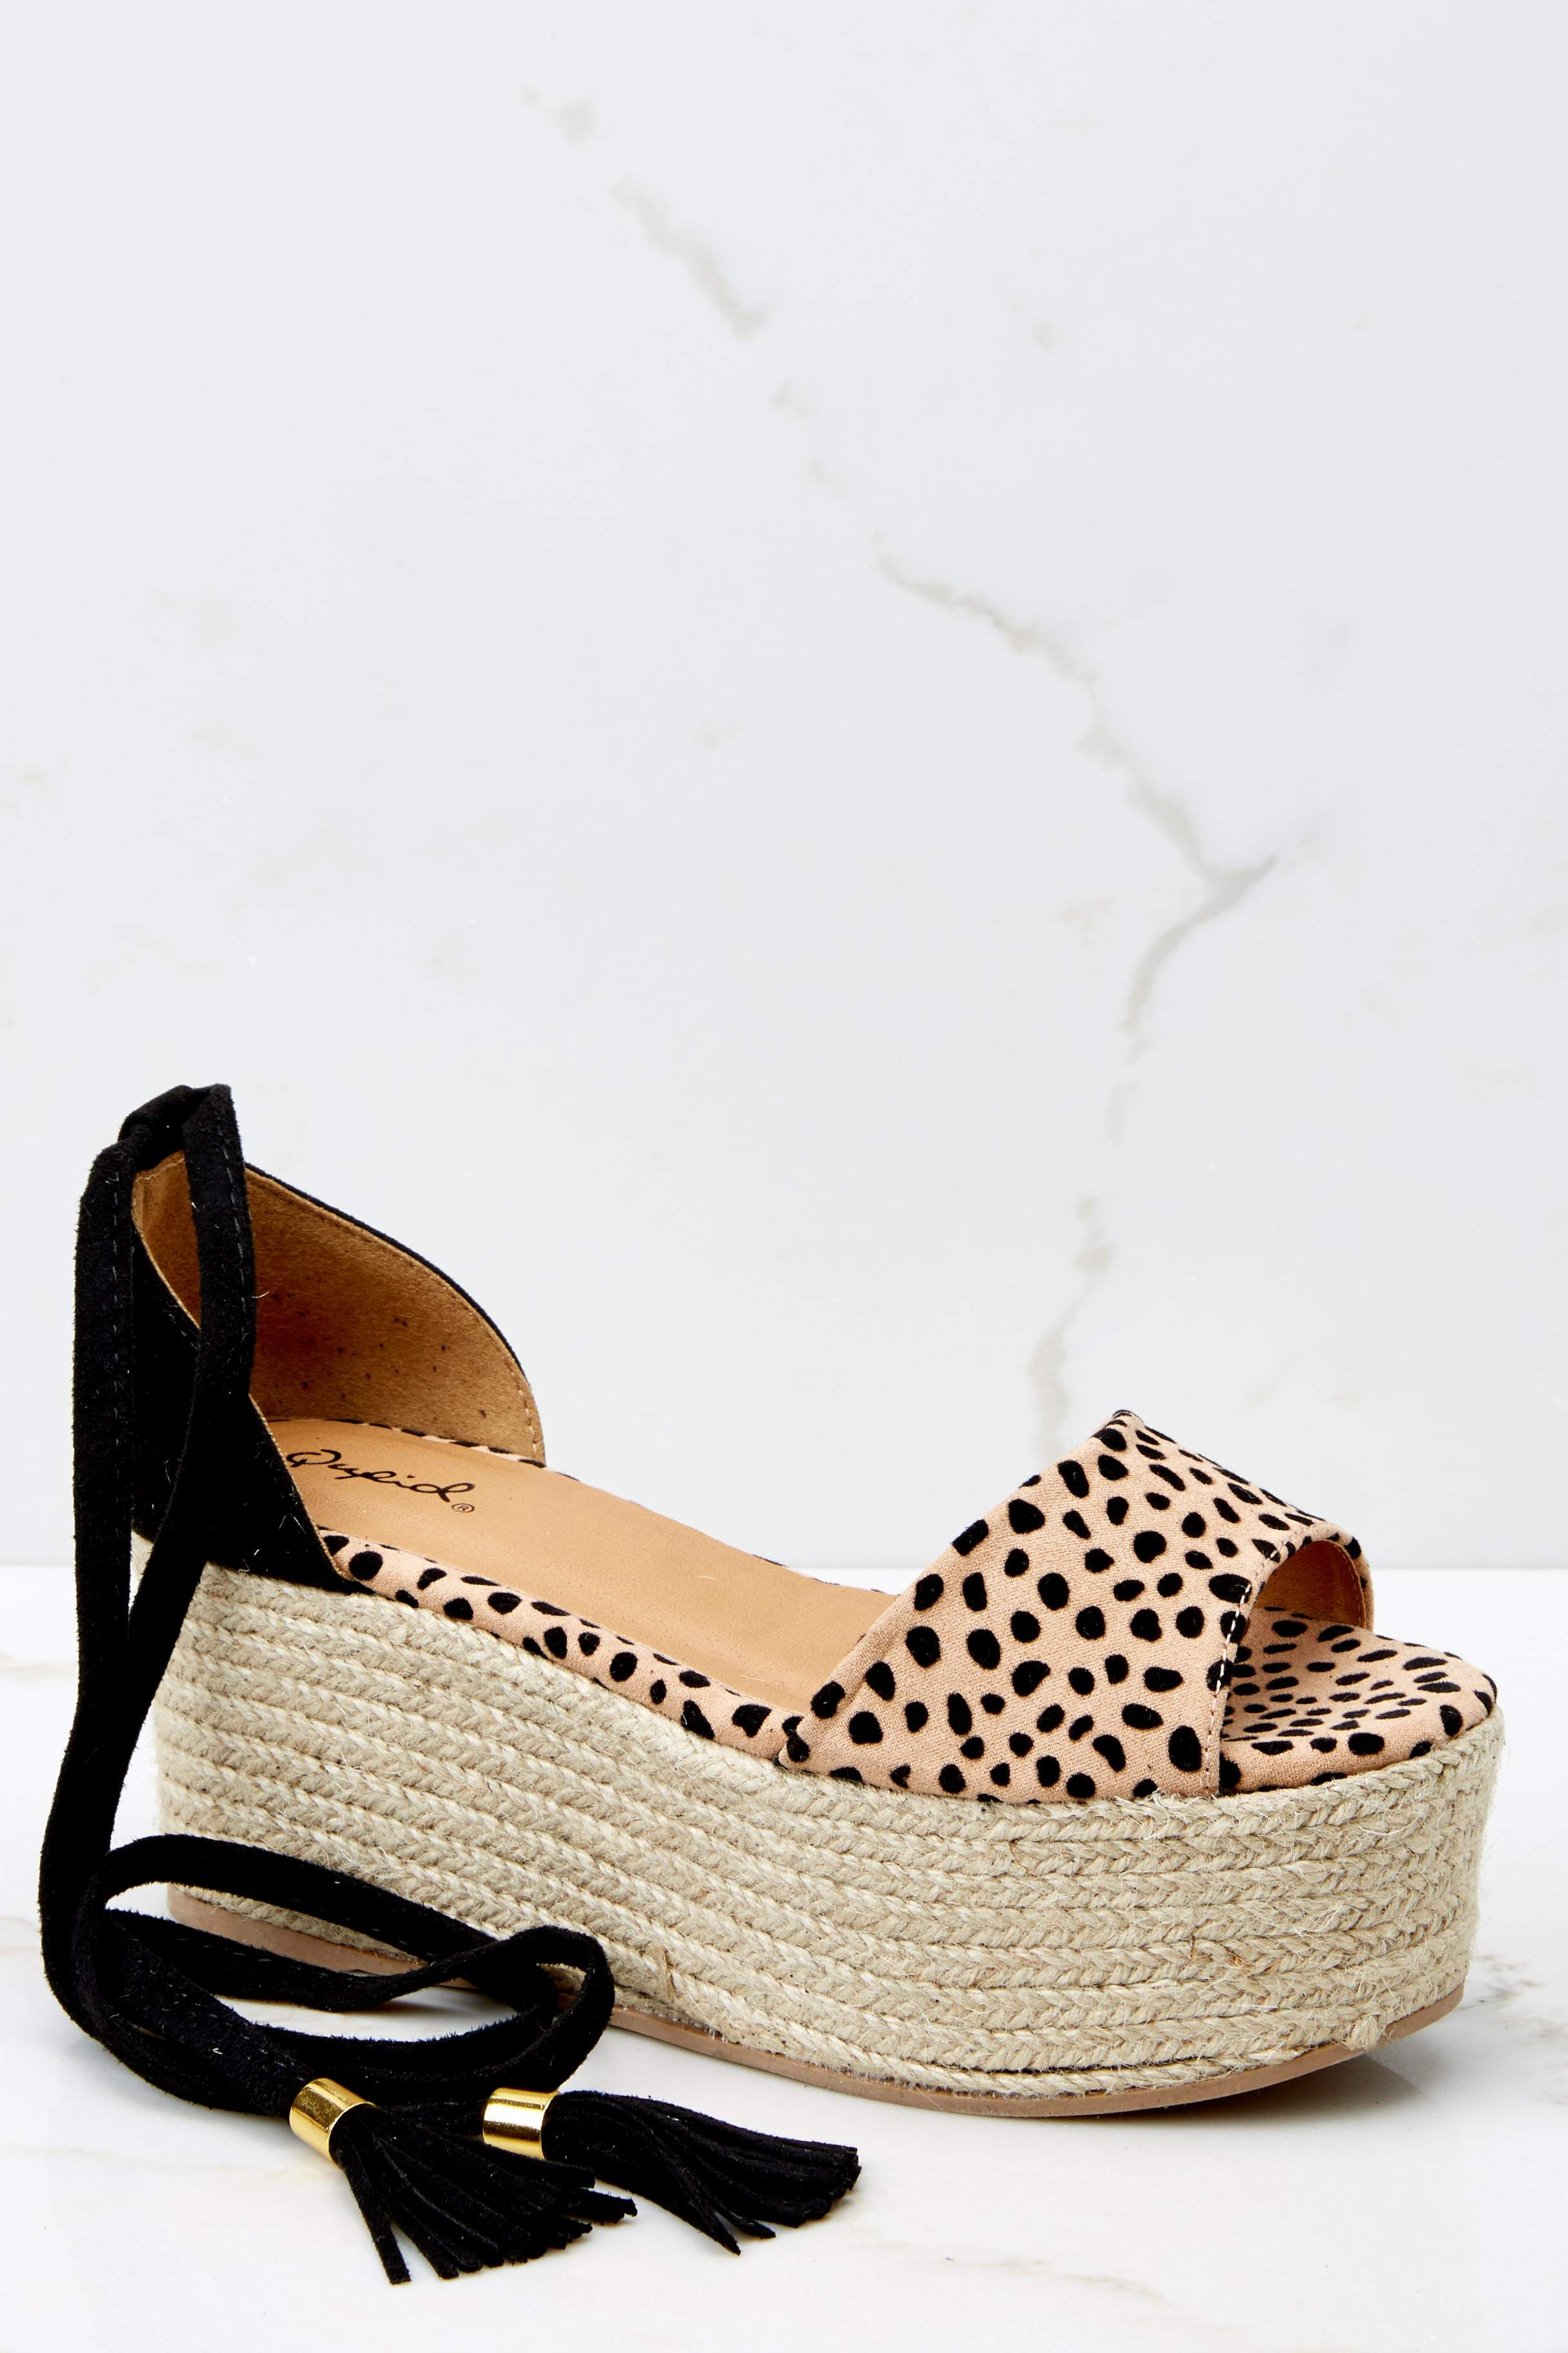 Coy Brown Cheetah Print Sandals